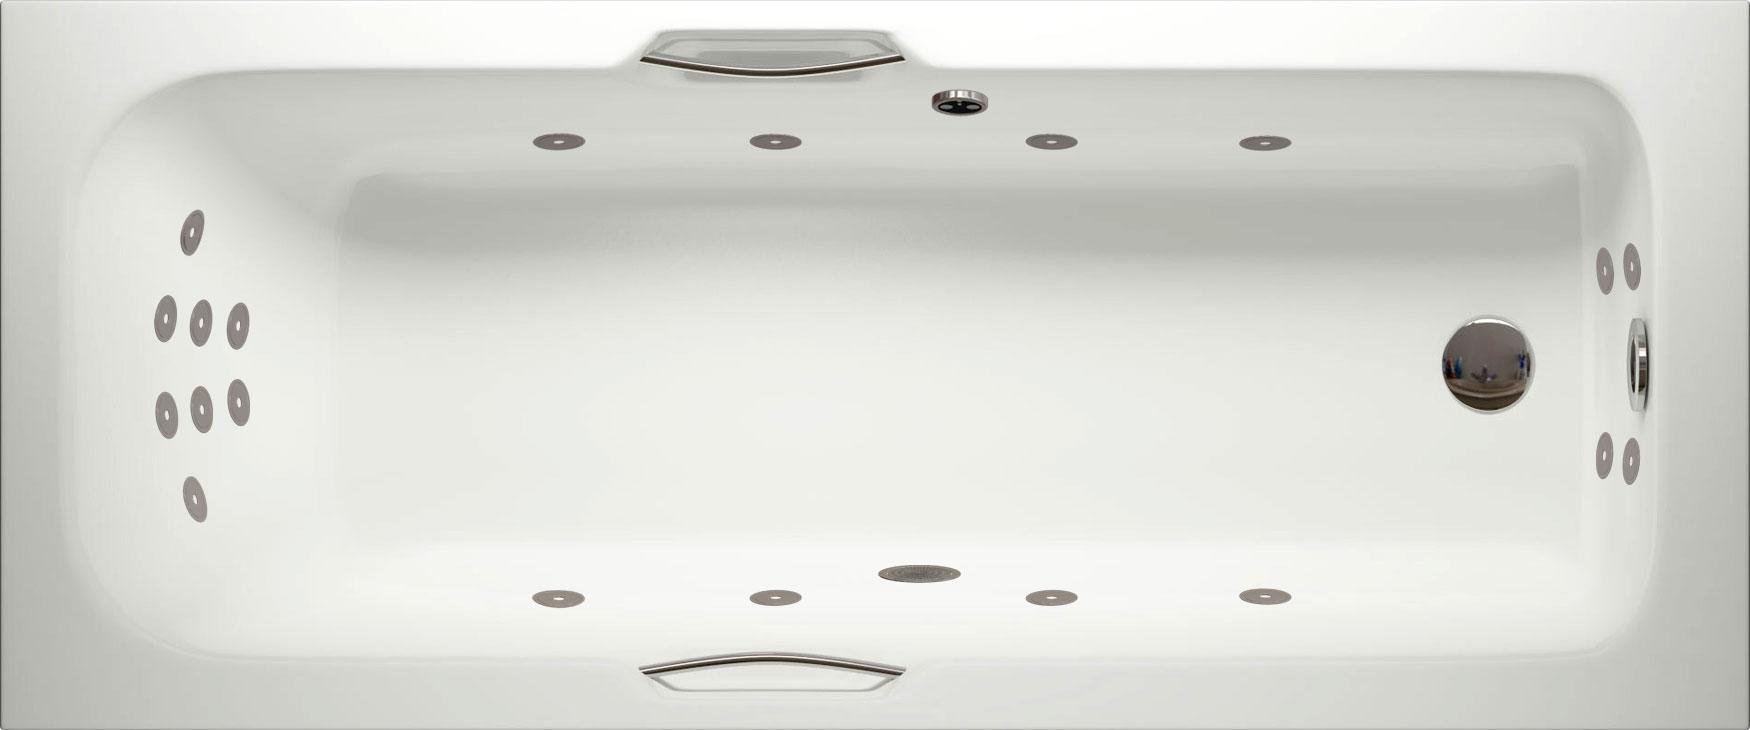 Avon Super Lux Single Ended Whirlpool Bath   Luna Spas